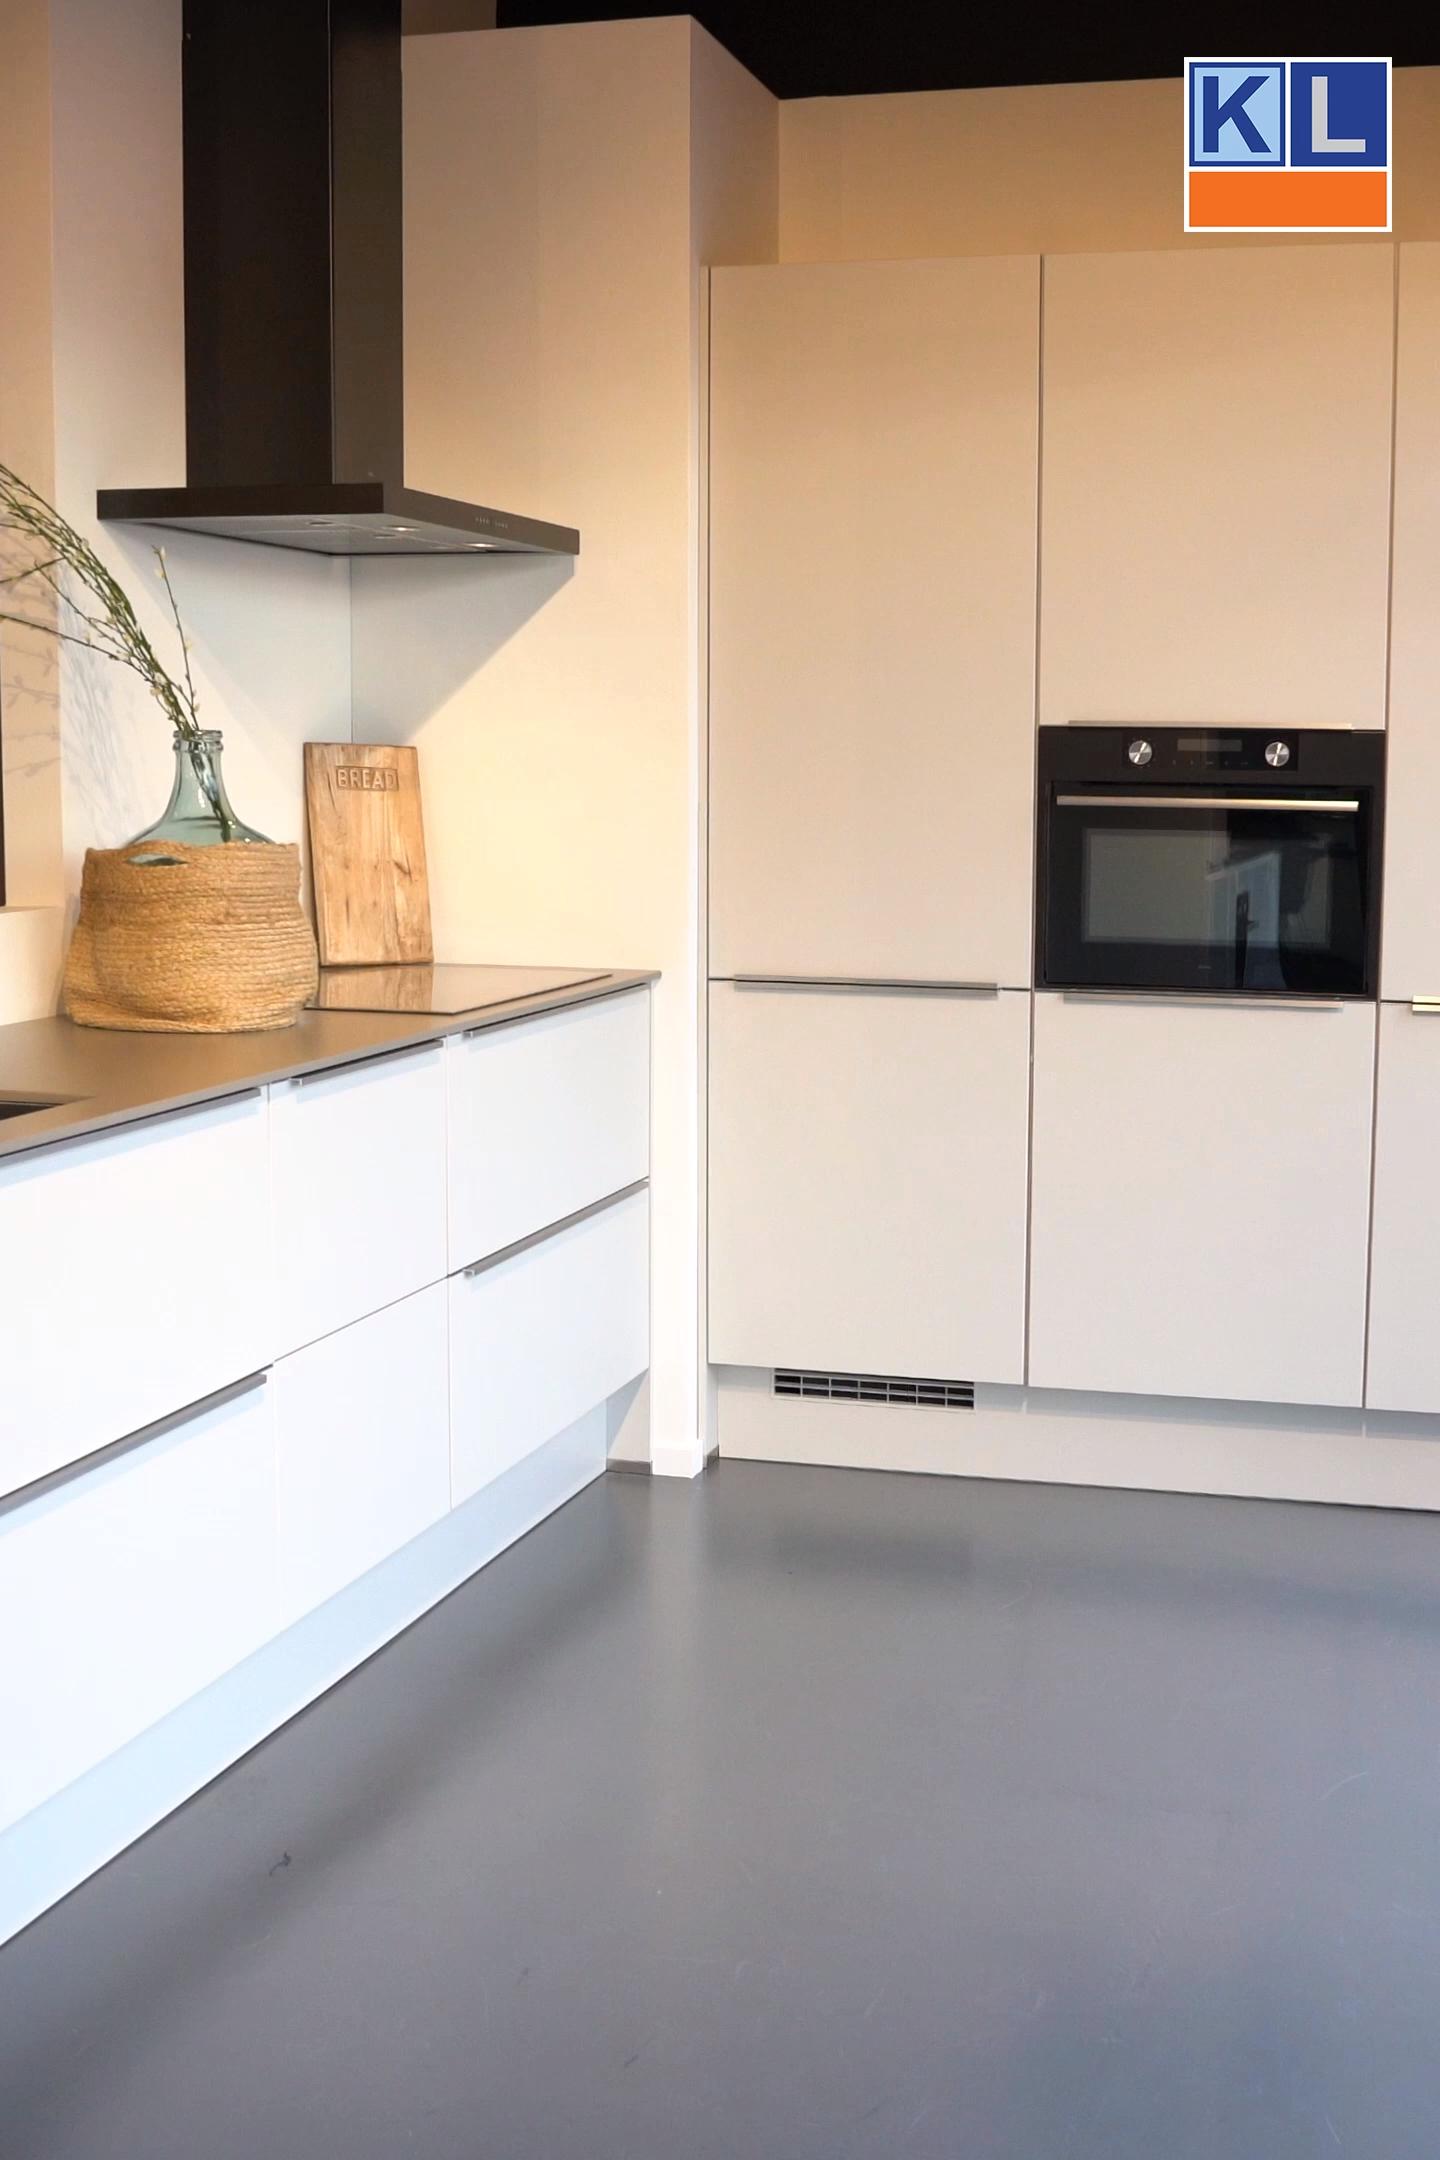 witte hoekkeuken video kucheneinrichtung kuchendekoration kuchenumbau